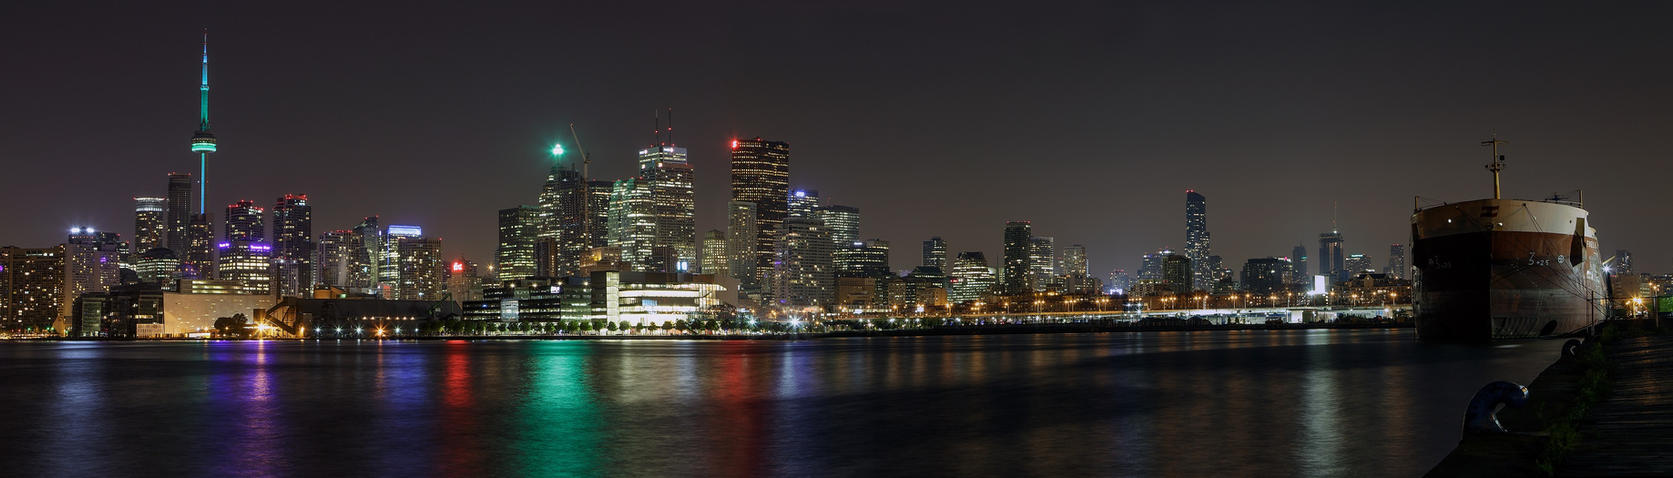 Toronto by SneachtaPix